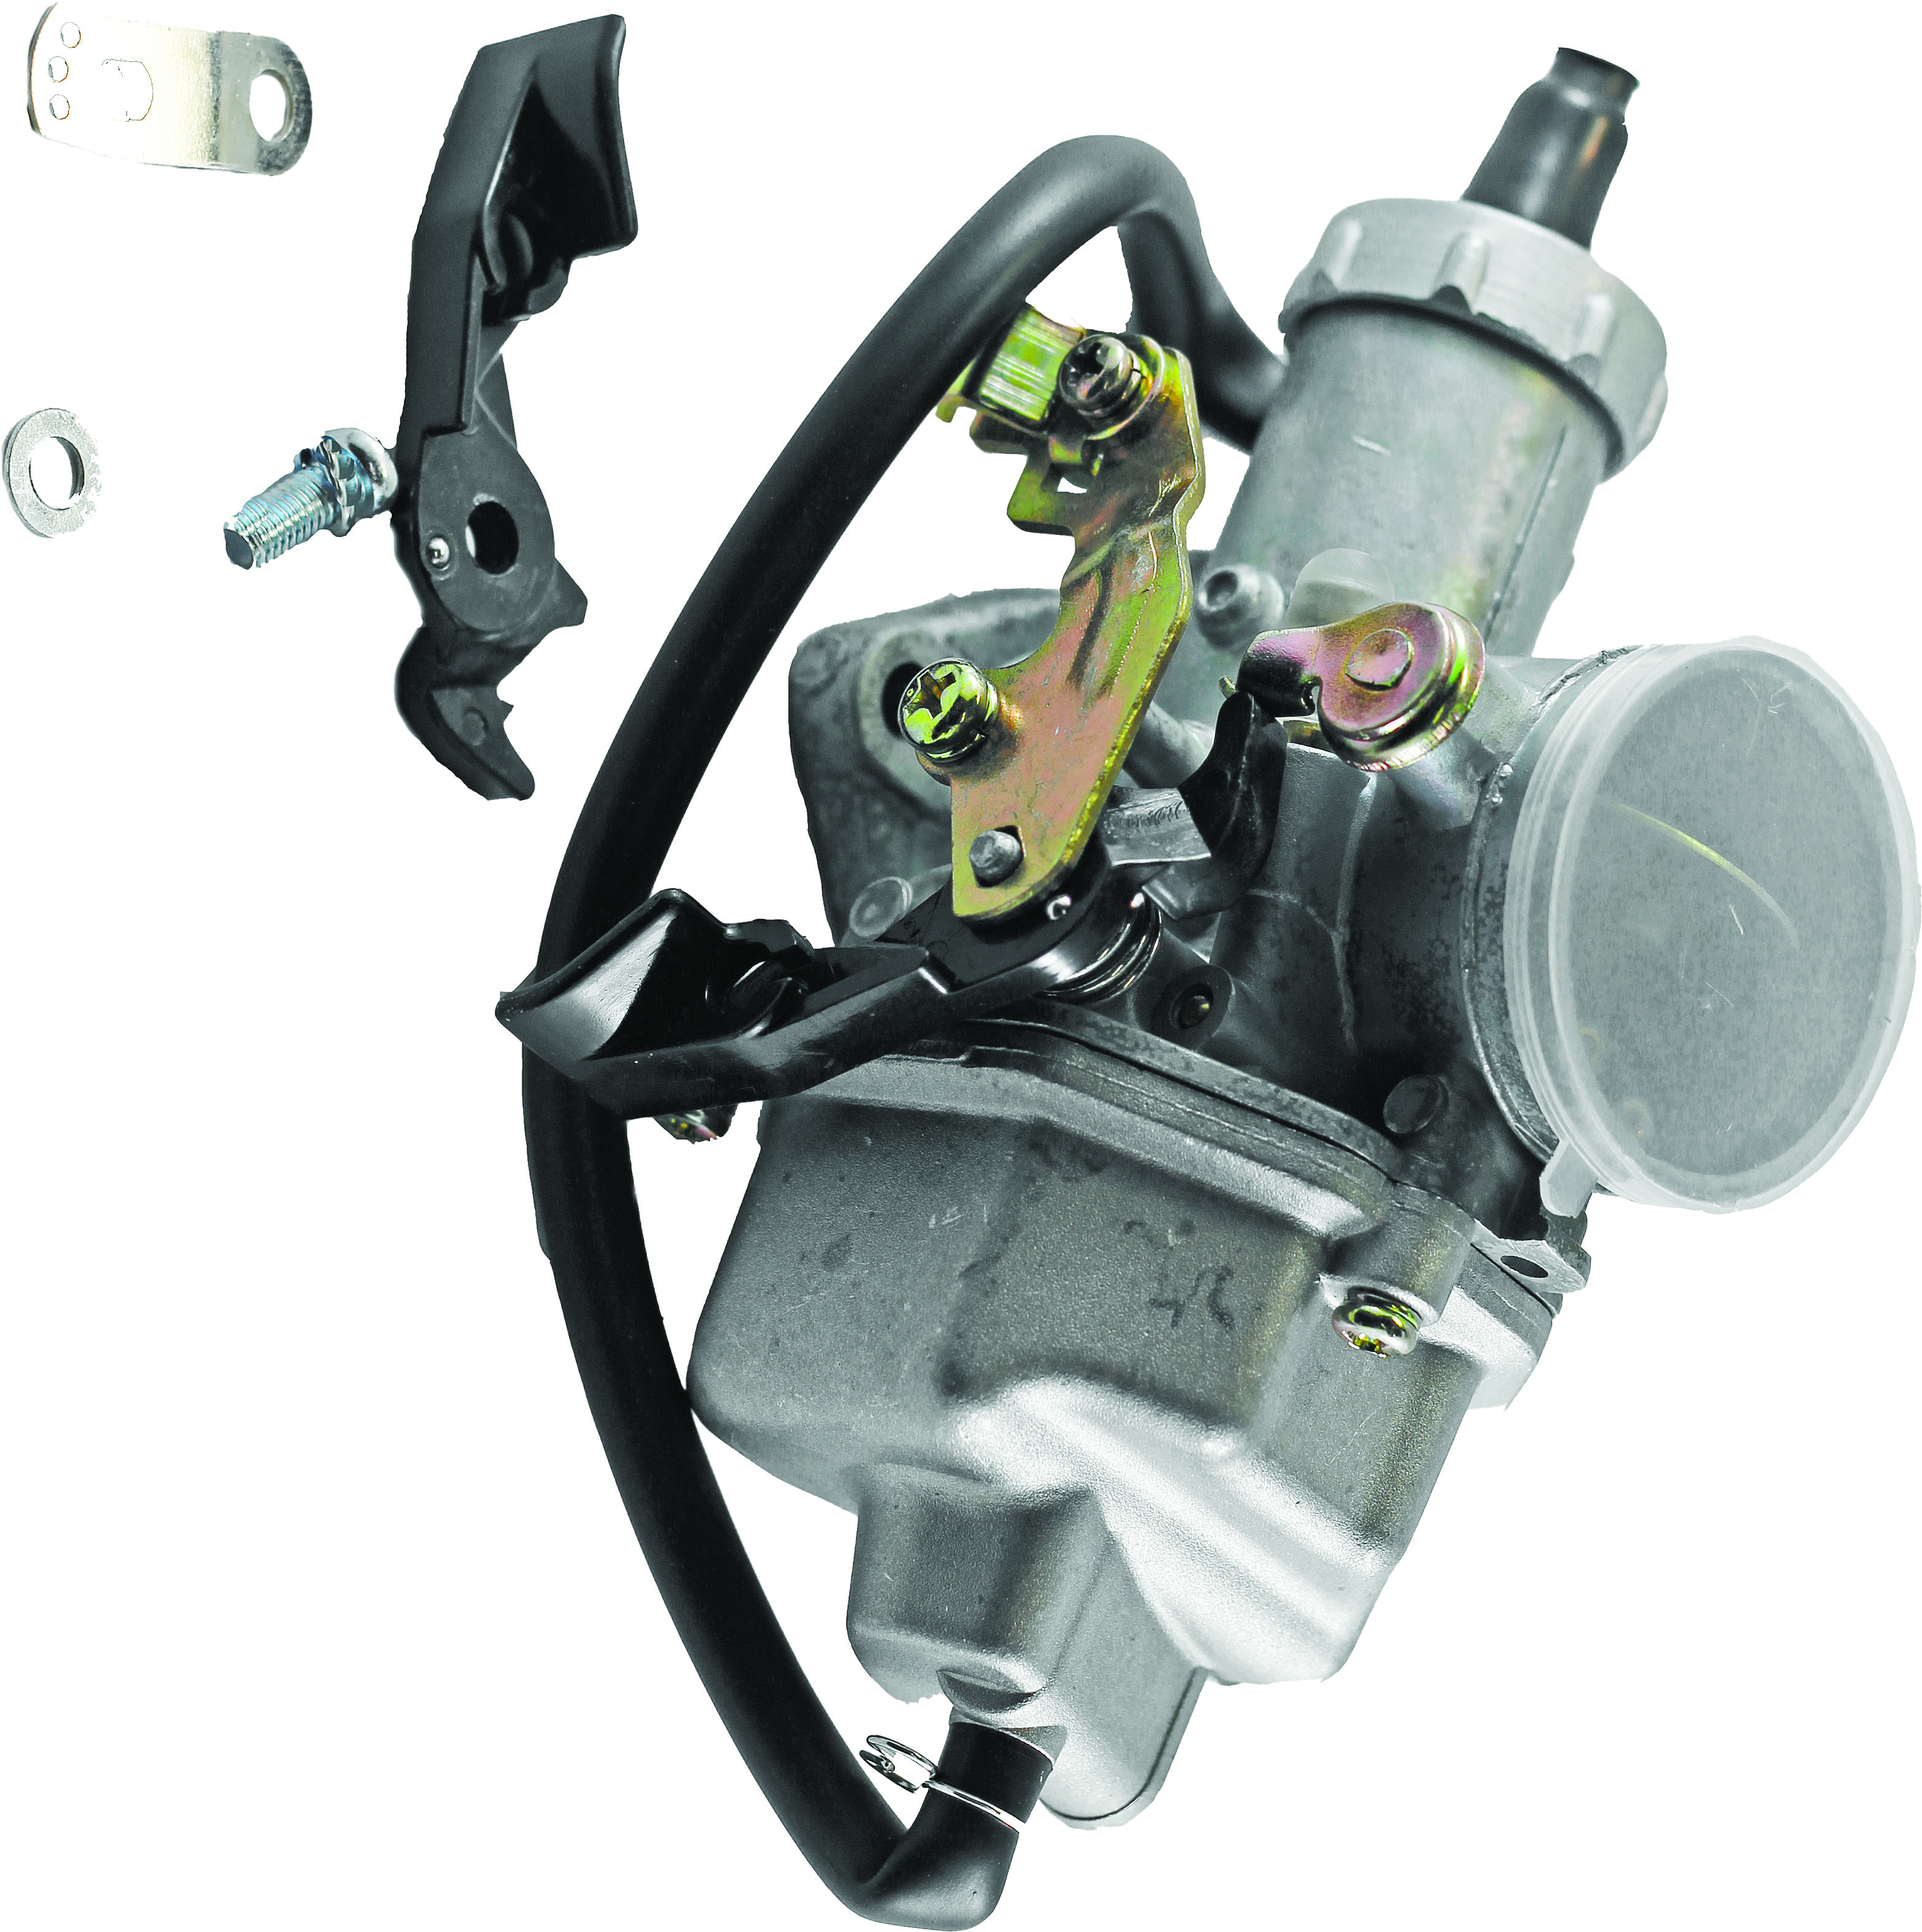 4-STROKE CARBURETOR 200-250cc